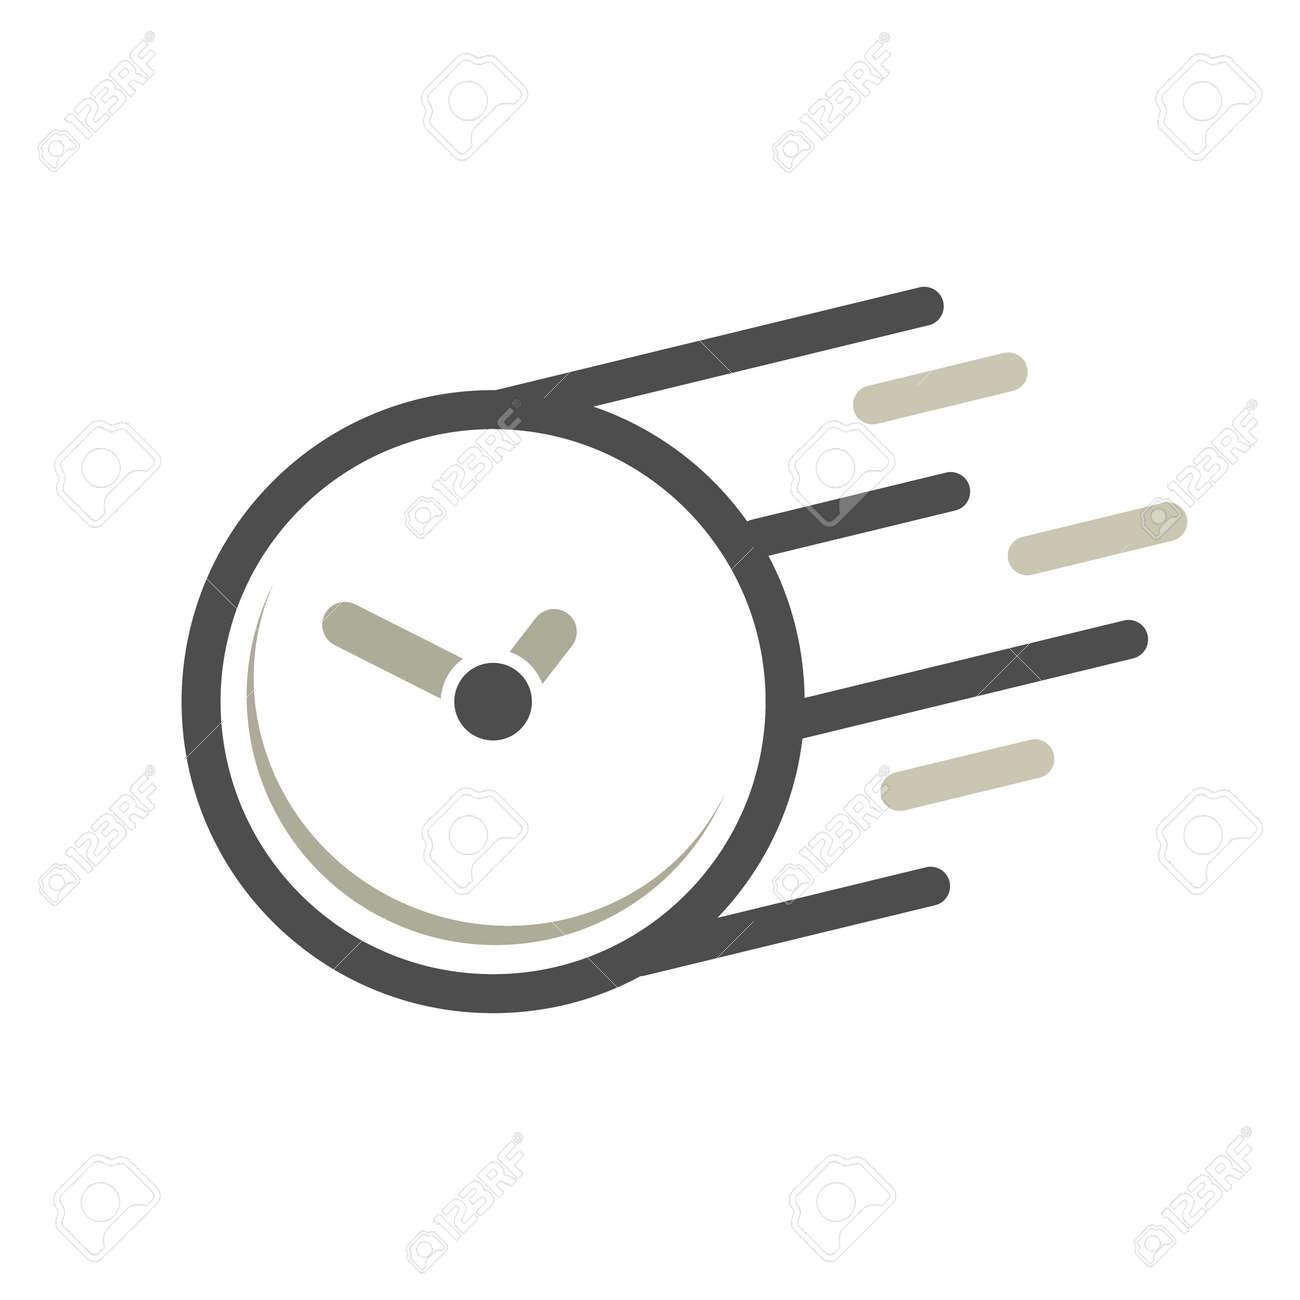 Fast time concept, rush hour logo, training session icon. Flat design illustration - 158733088